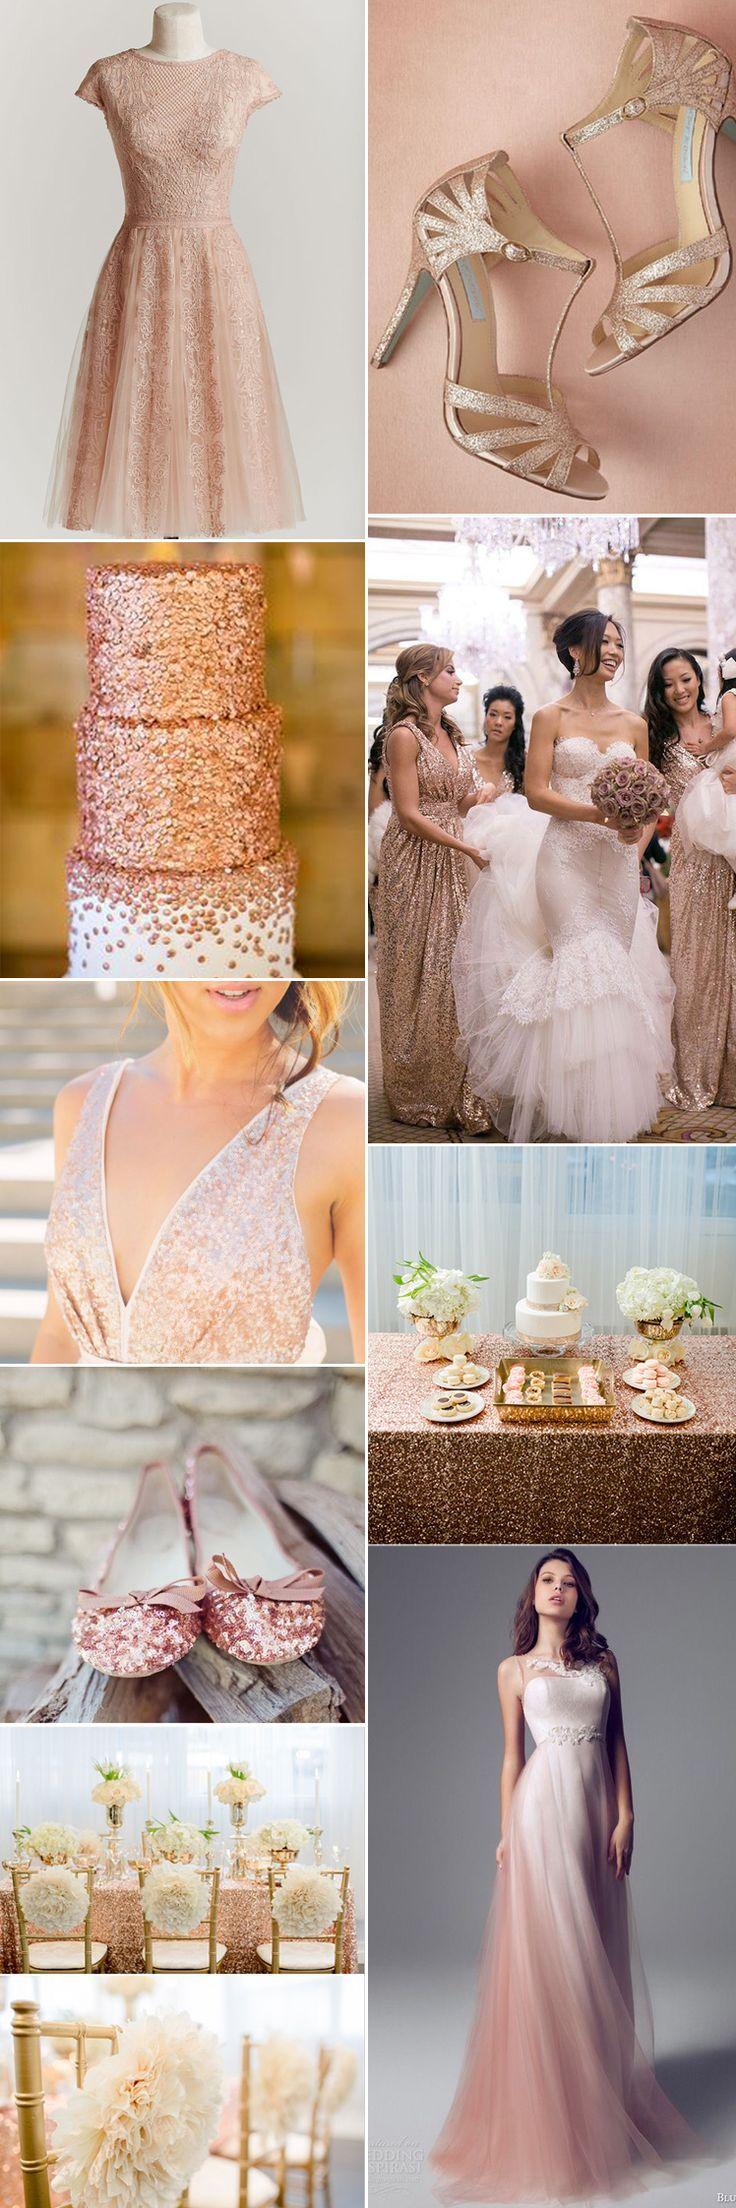 Rose colored wedding dress  Rose Gold Wedding Inspiration  Romantic weddings Metallic and Romantic